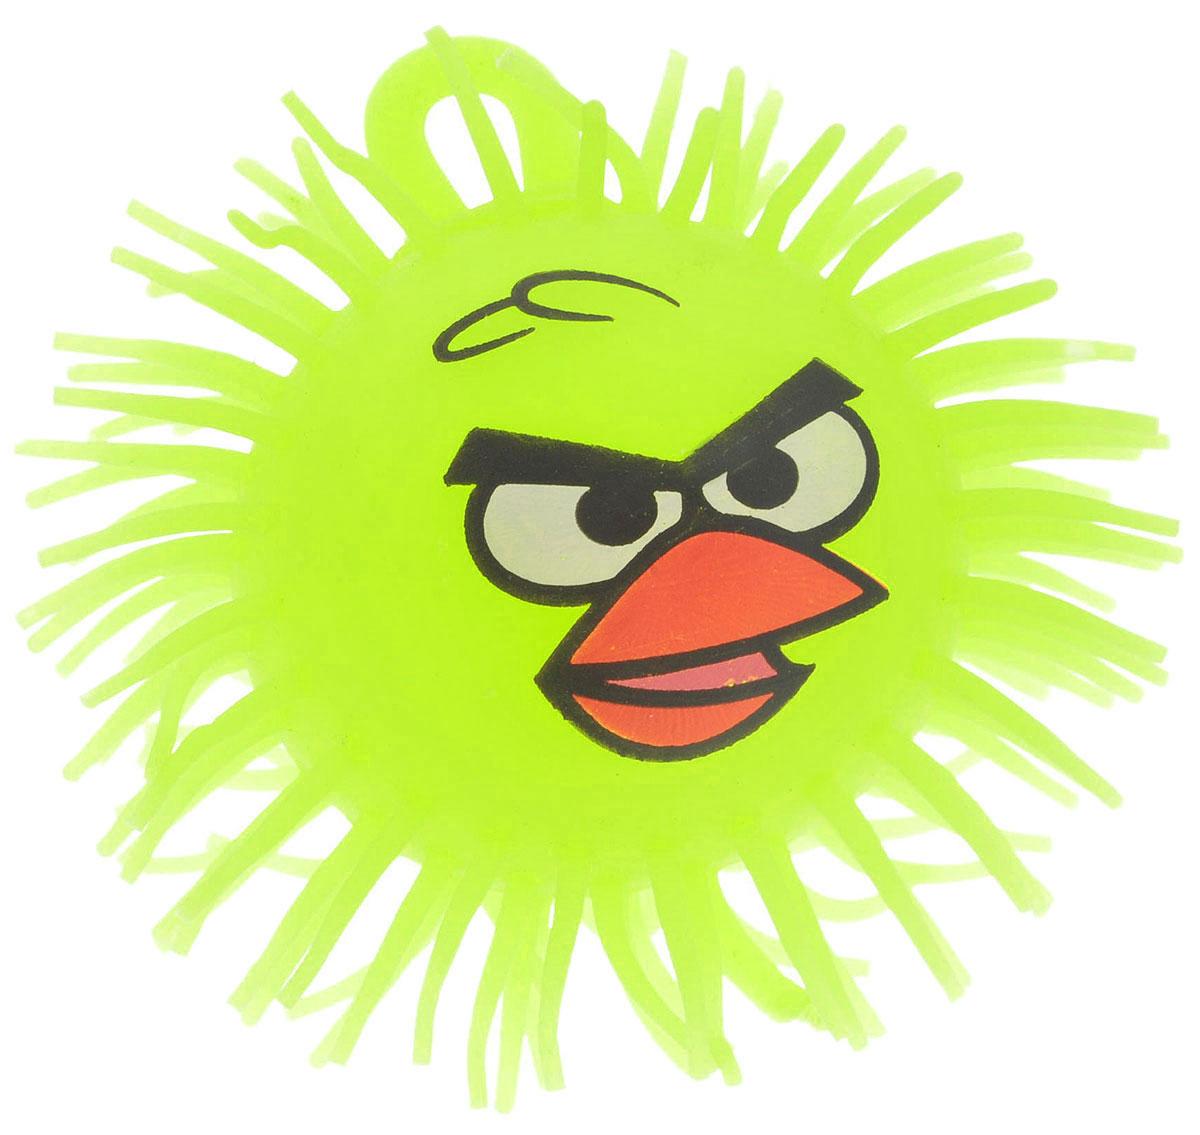 1TOY Игрушка-антистресс Ё-Ёжик Злая птичка цвет желтый диаметр 12 см злая птица ё ёжик со светомт56233